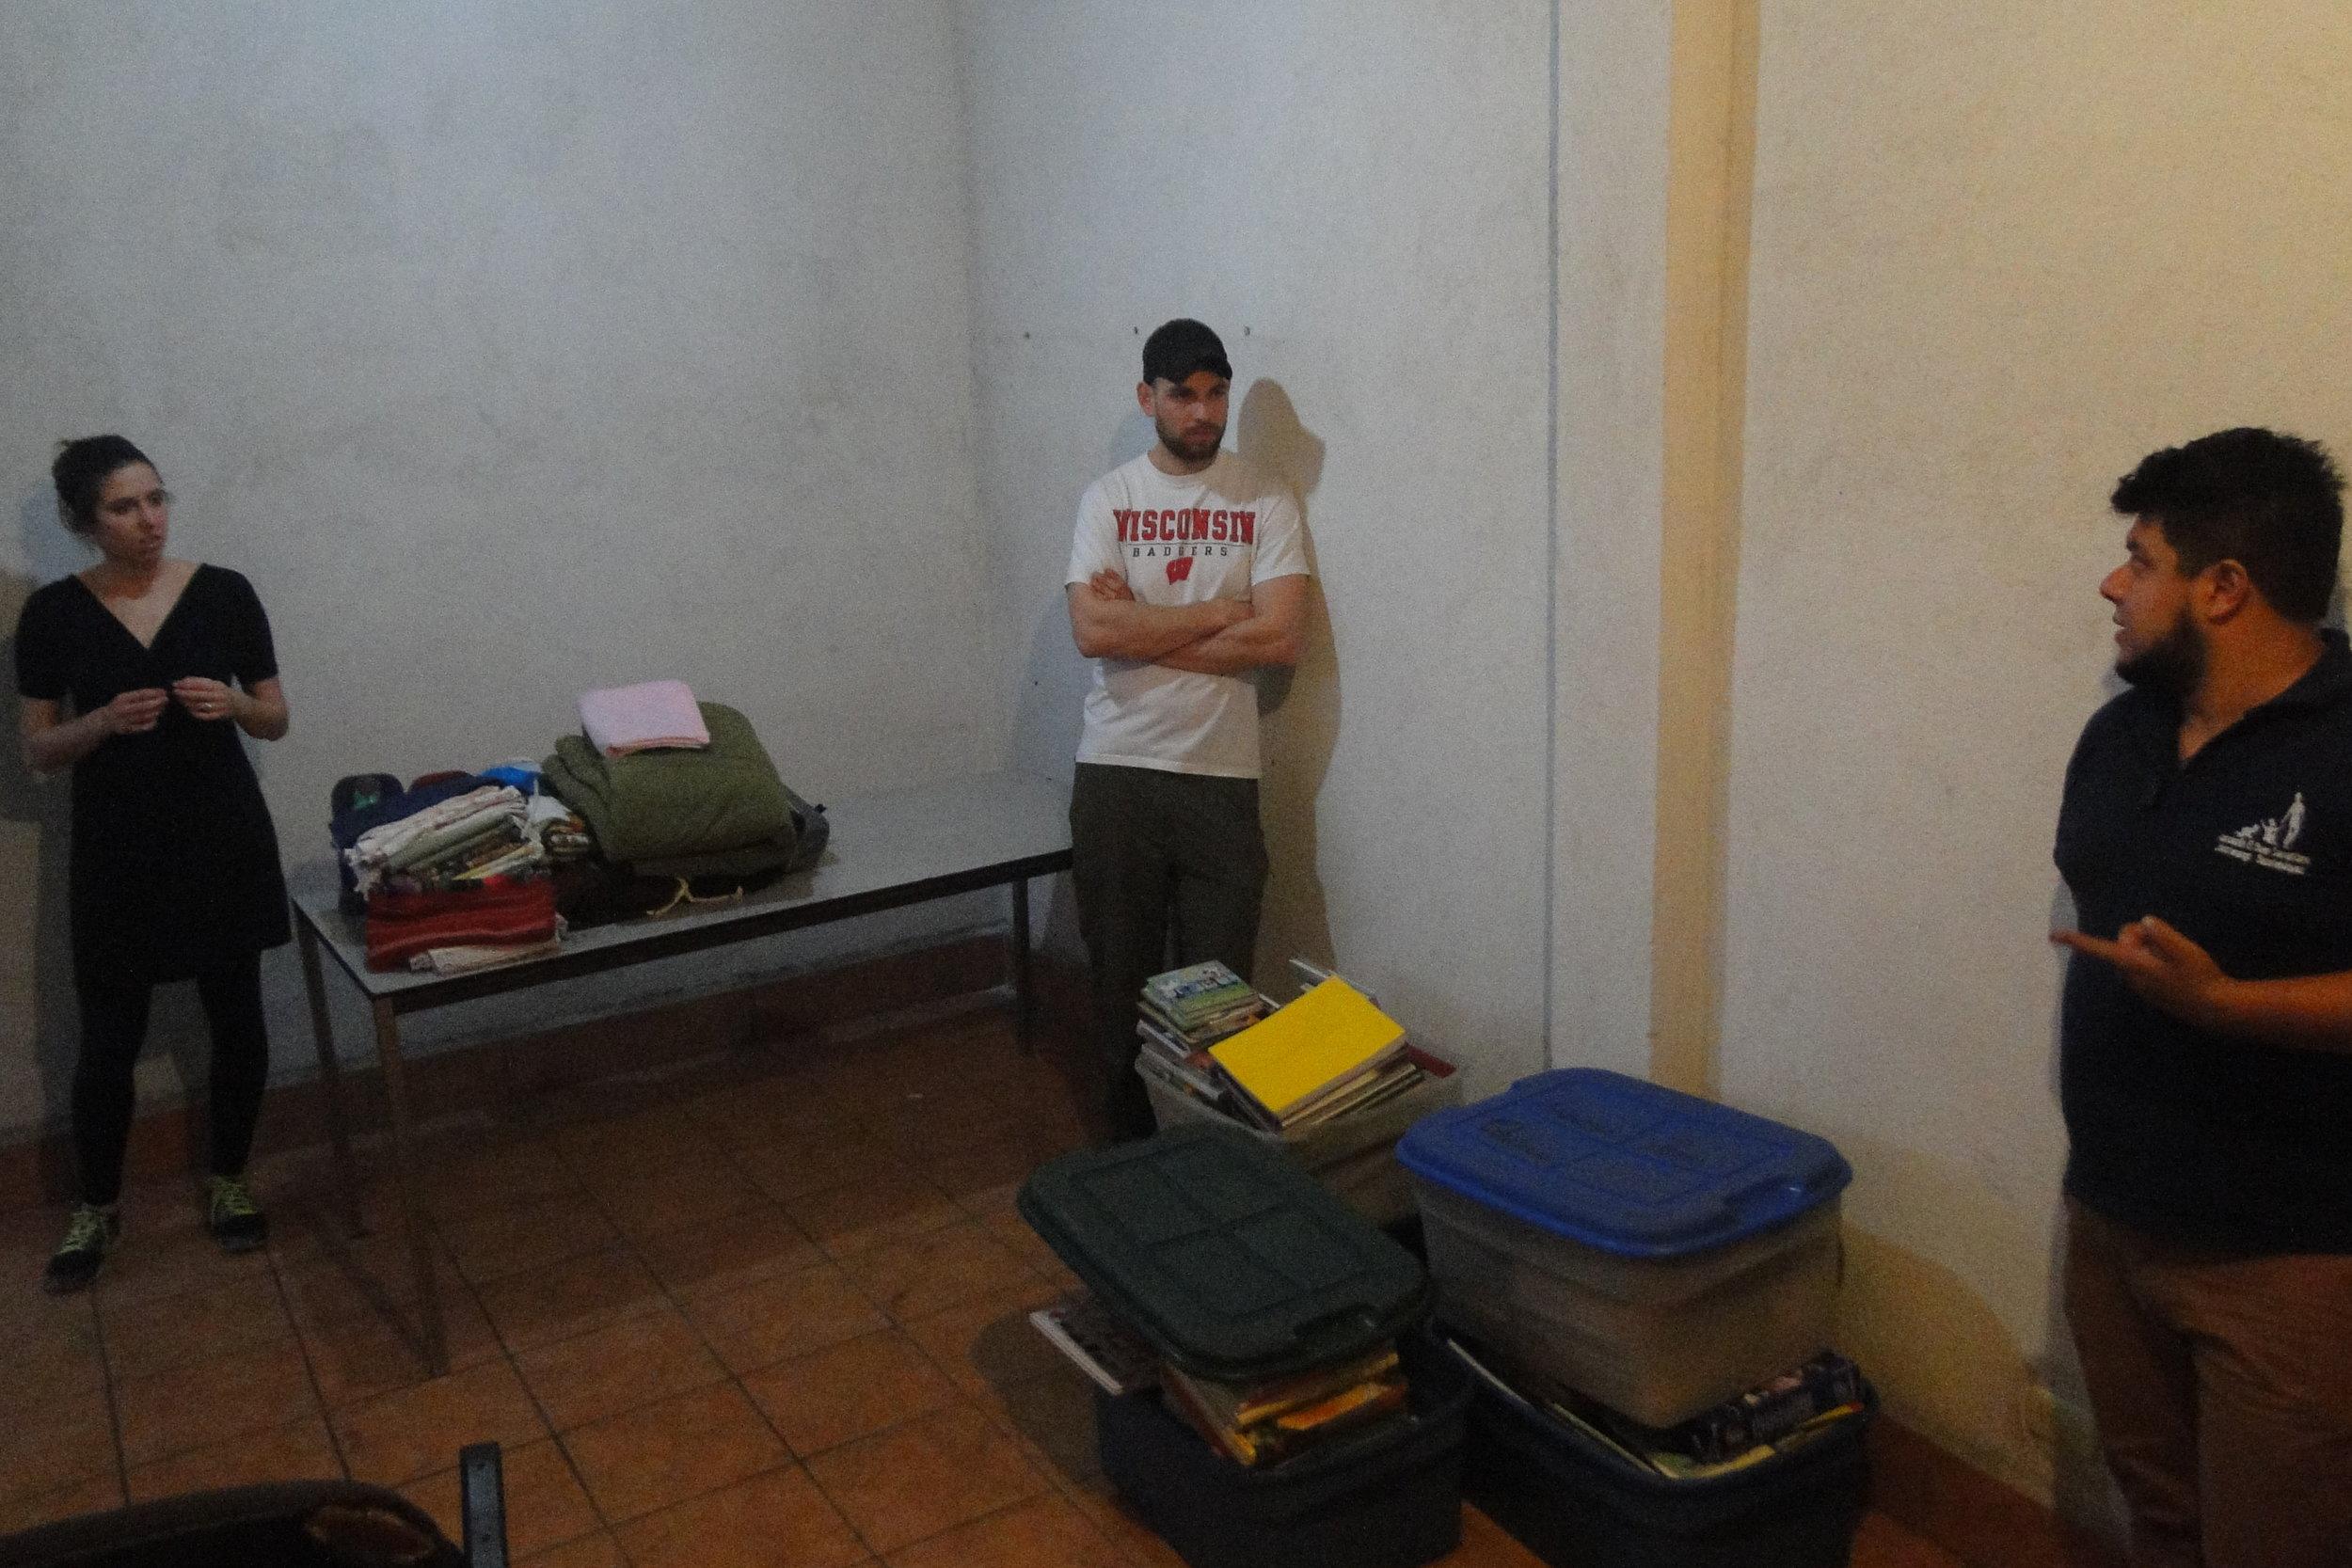 The room before we began working